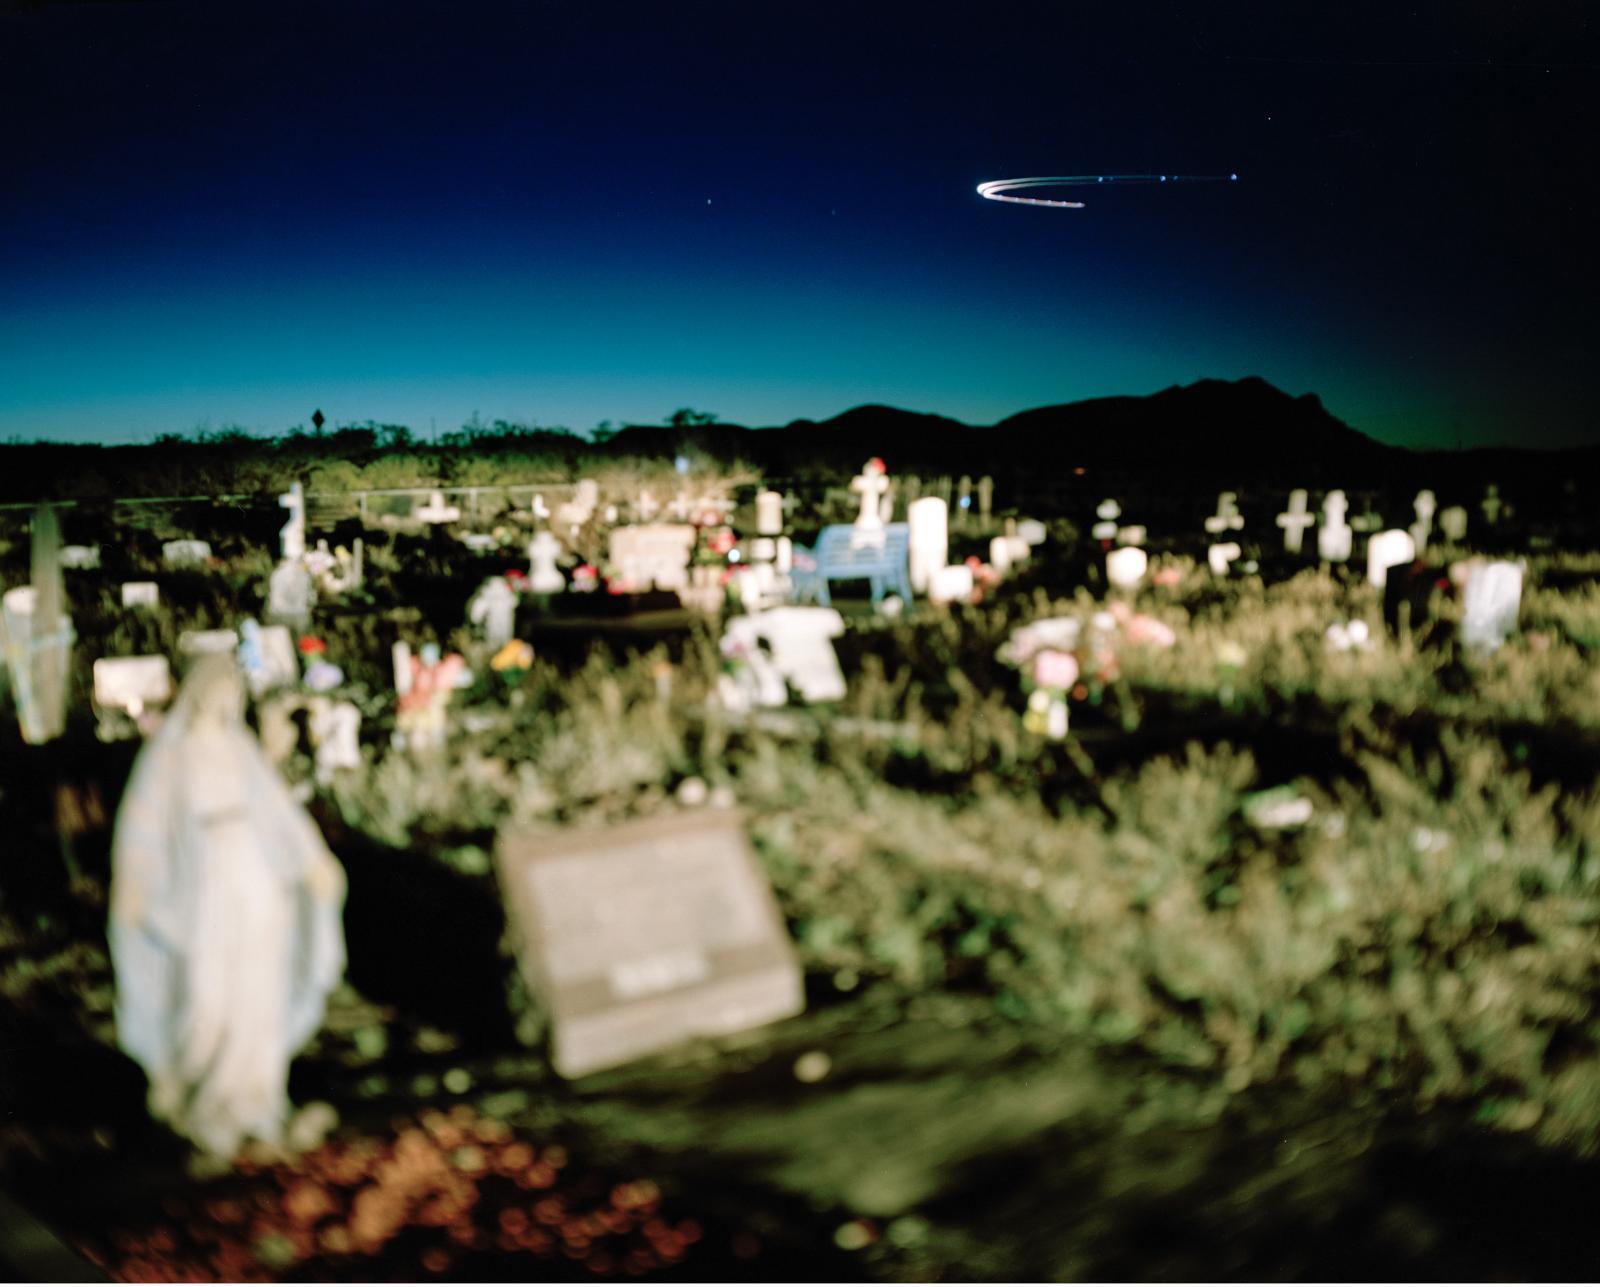 Luis Lopez Cemetery, New Mexico, USA, 2016